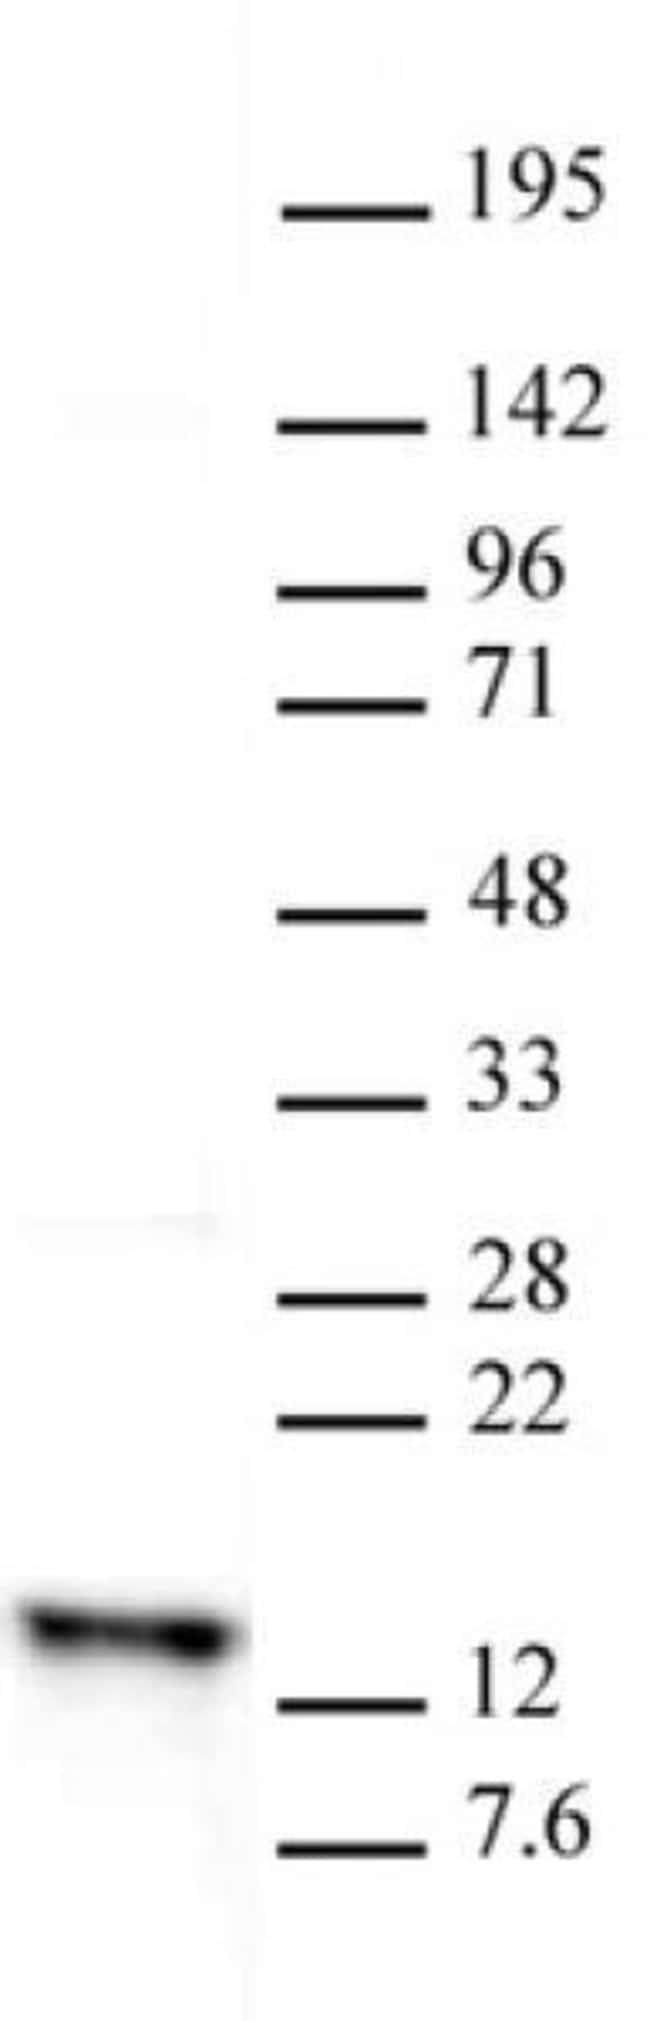 Histone H2A Rabbit anti-Yeast, Unconjugated, Polyclonal, Active Motif:Antibodies:Primary